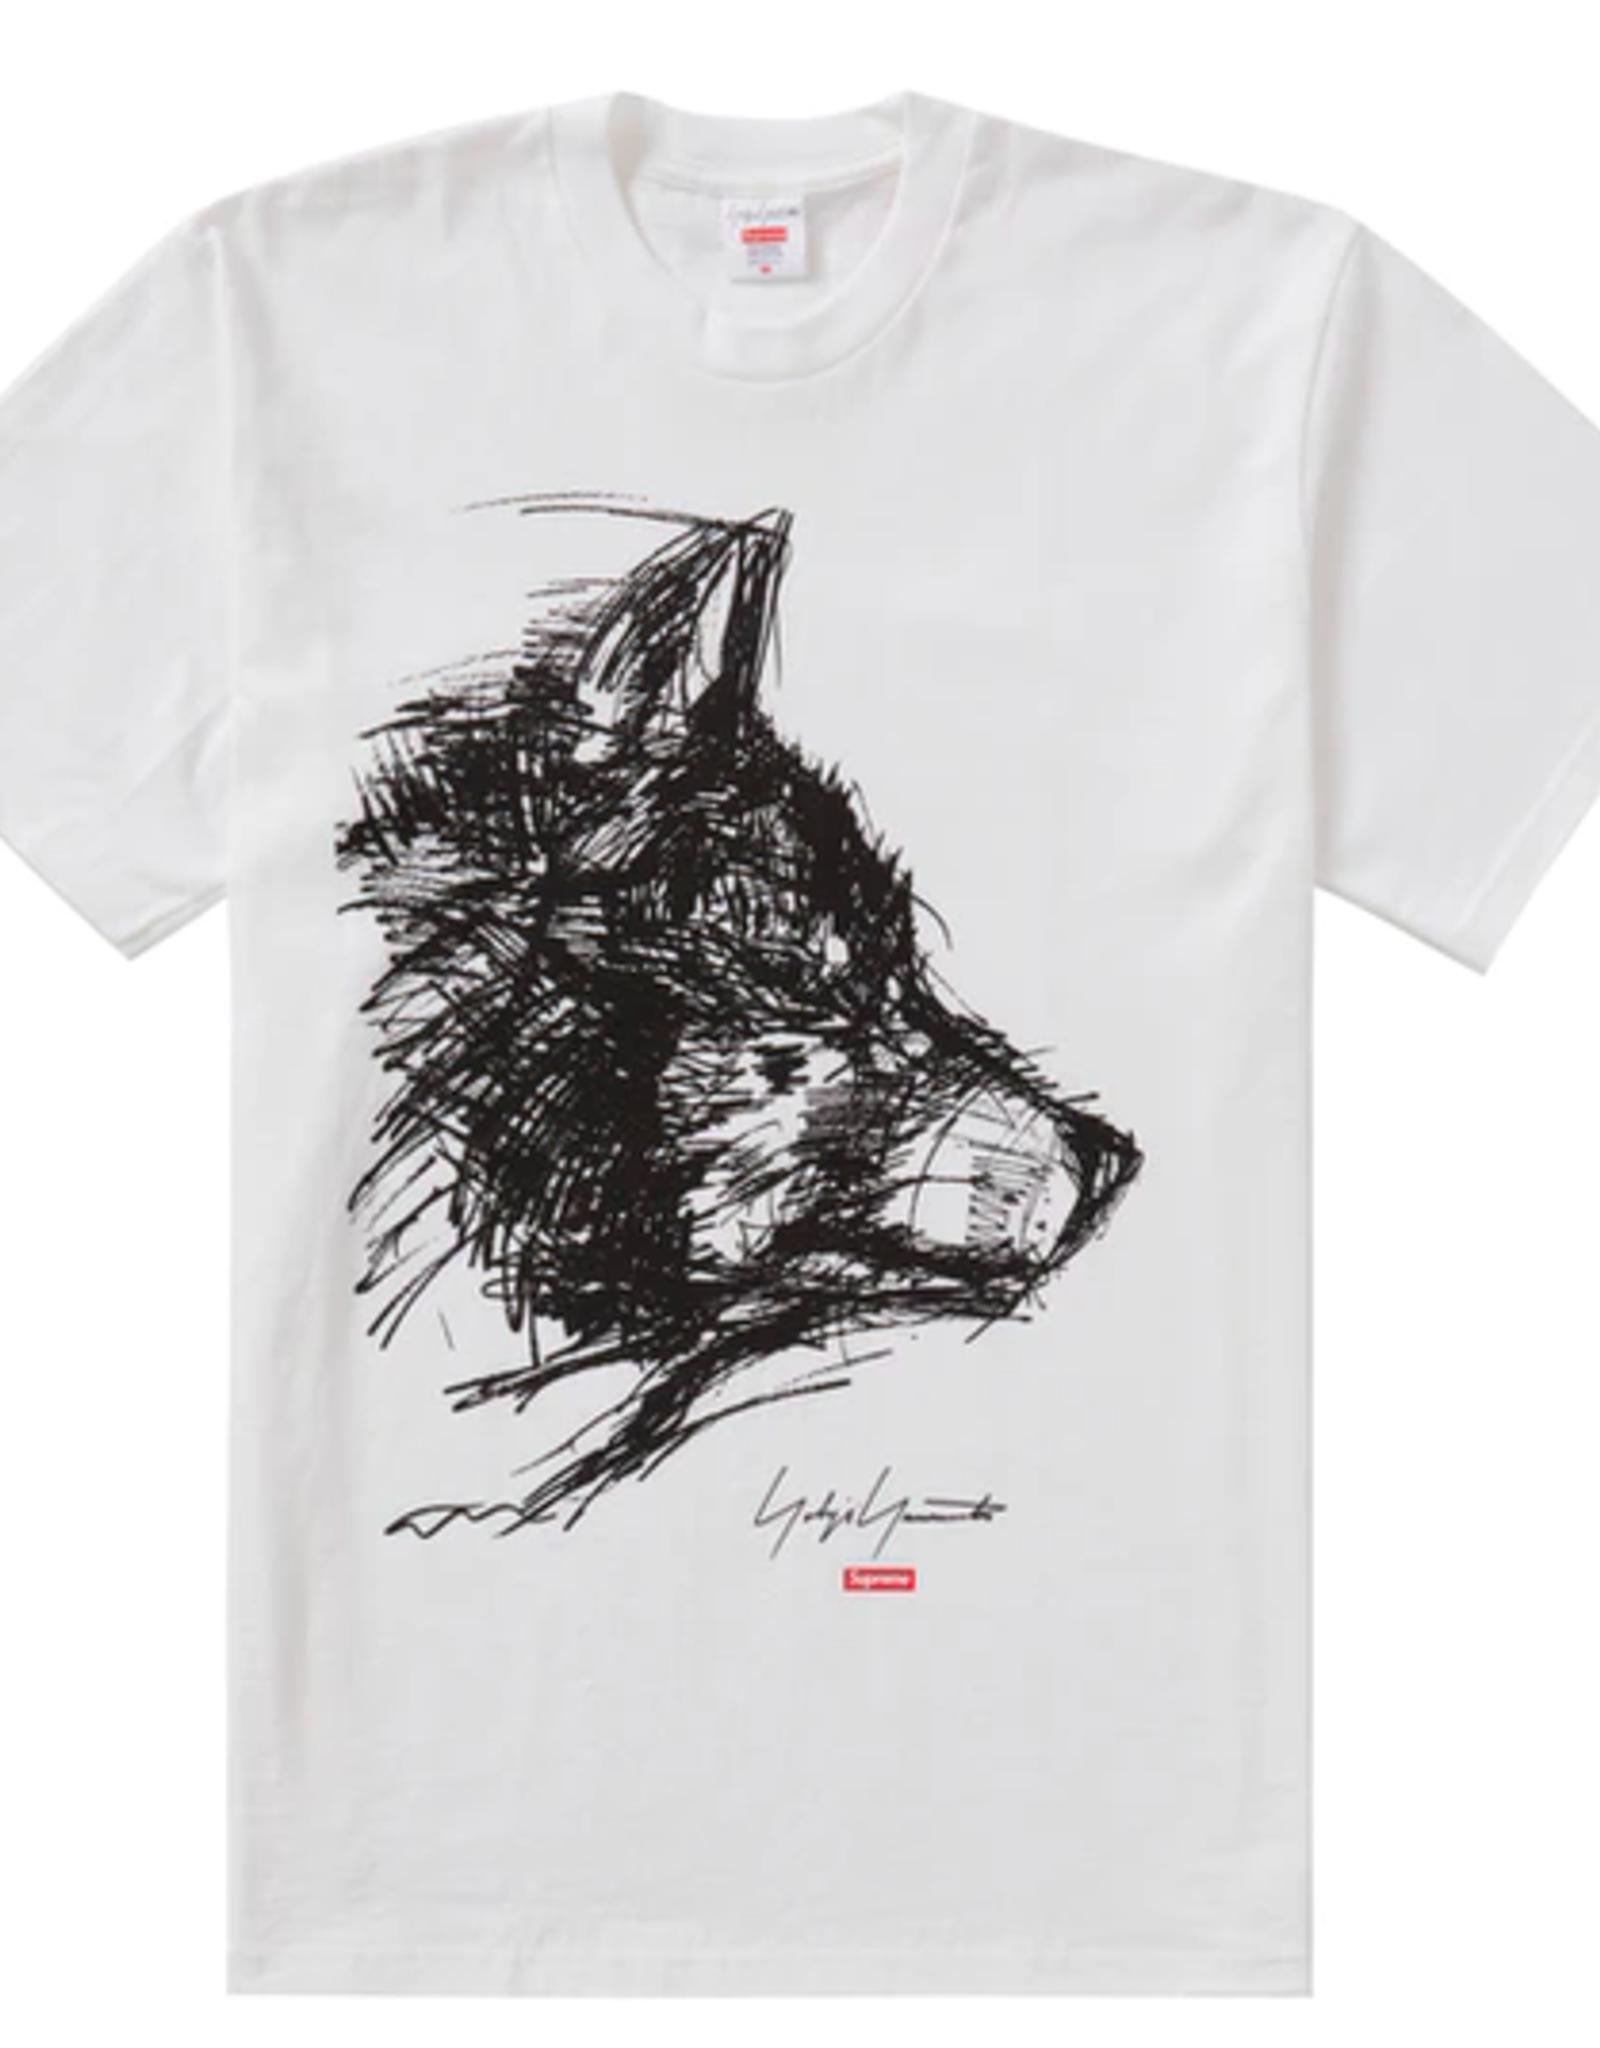 SUPREME Yohji Yamamoto Scribble Wolf Tee White MED